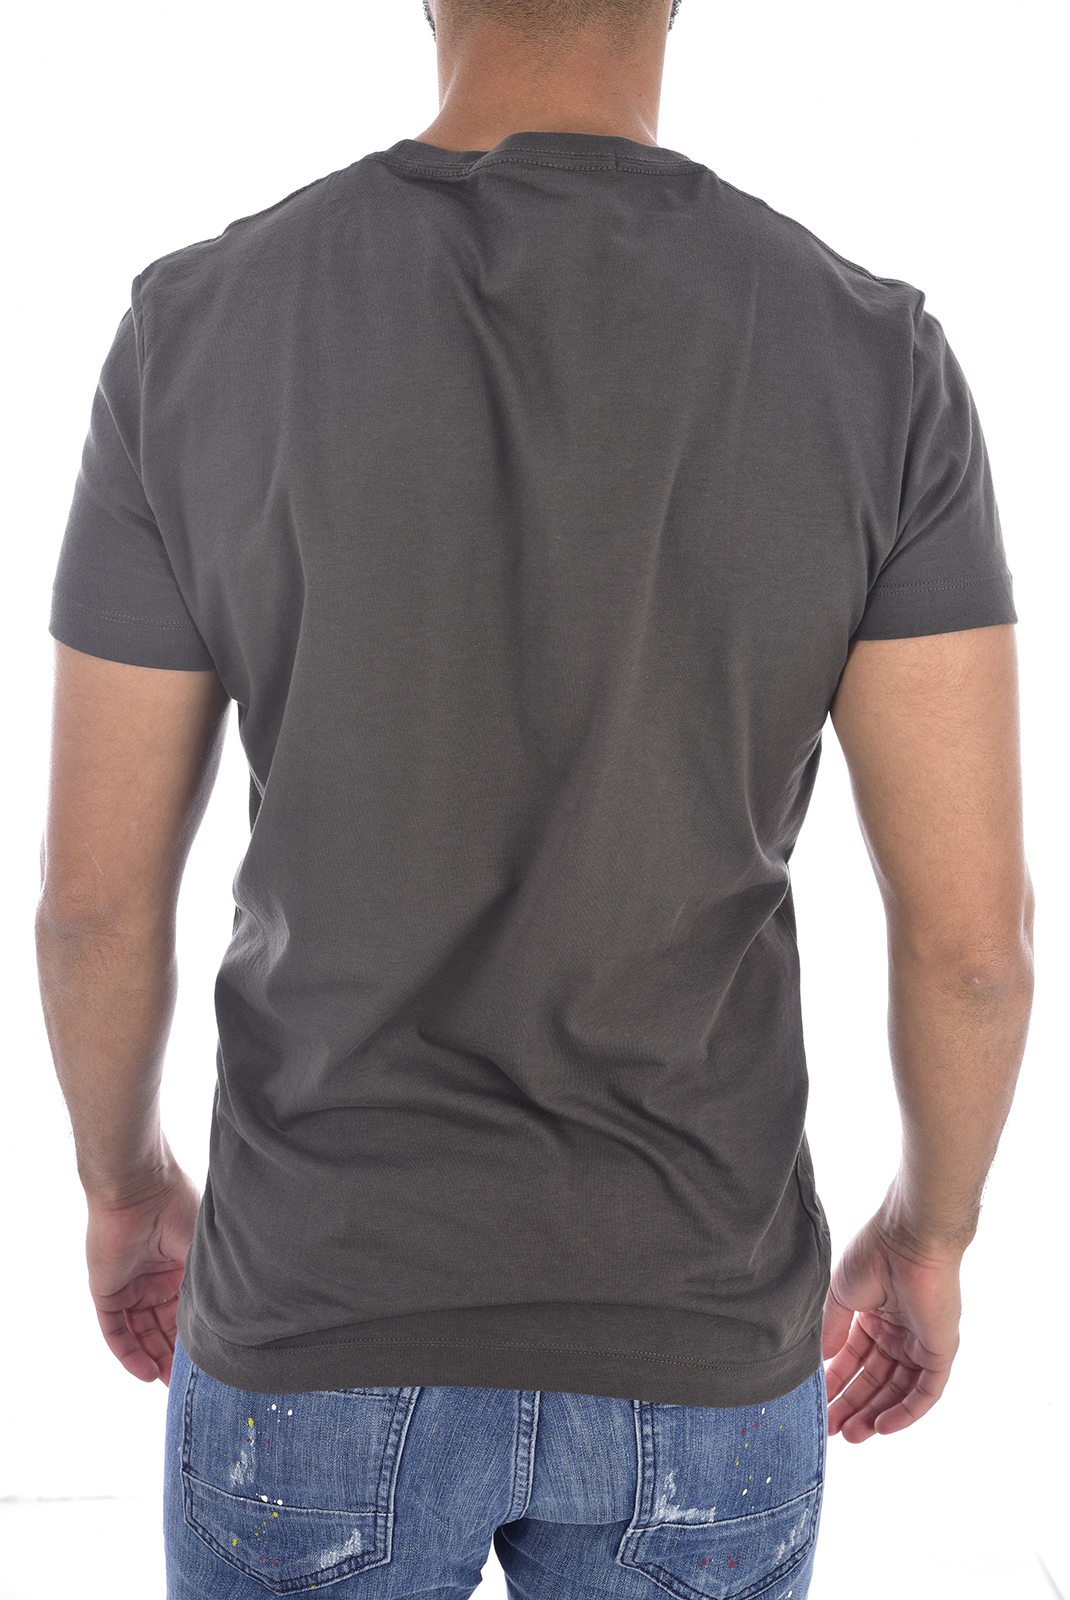 Tee-shirts  Calvin klein J30J307856 BA5 RAVEN